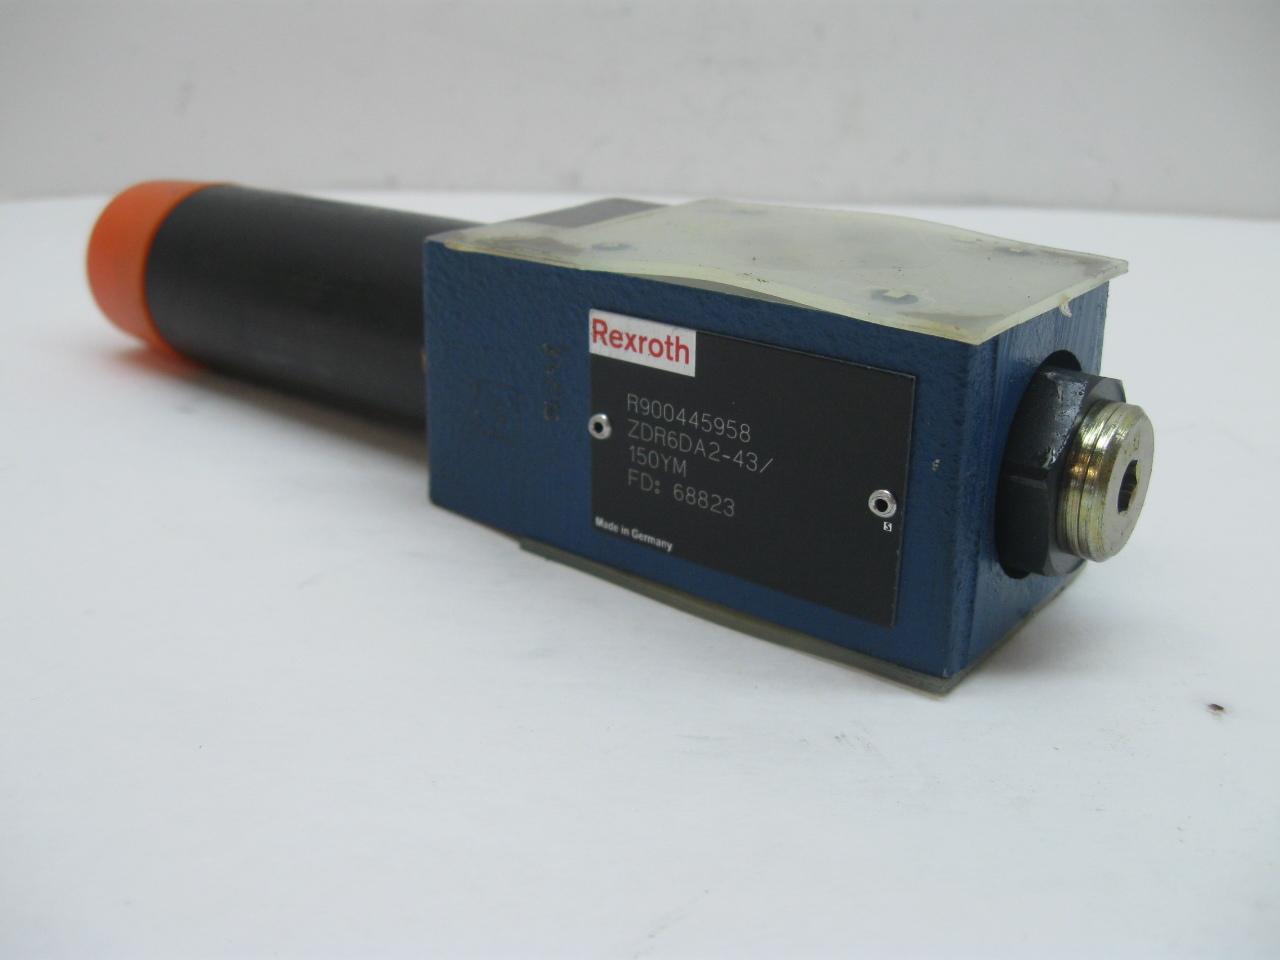 Rexroth ZDR6DA2-43/150YM Pressure Reducing Hydraulic Valve New